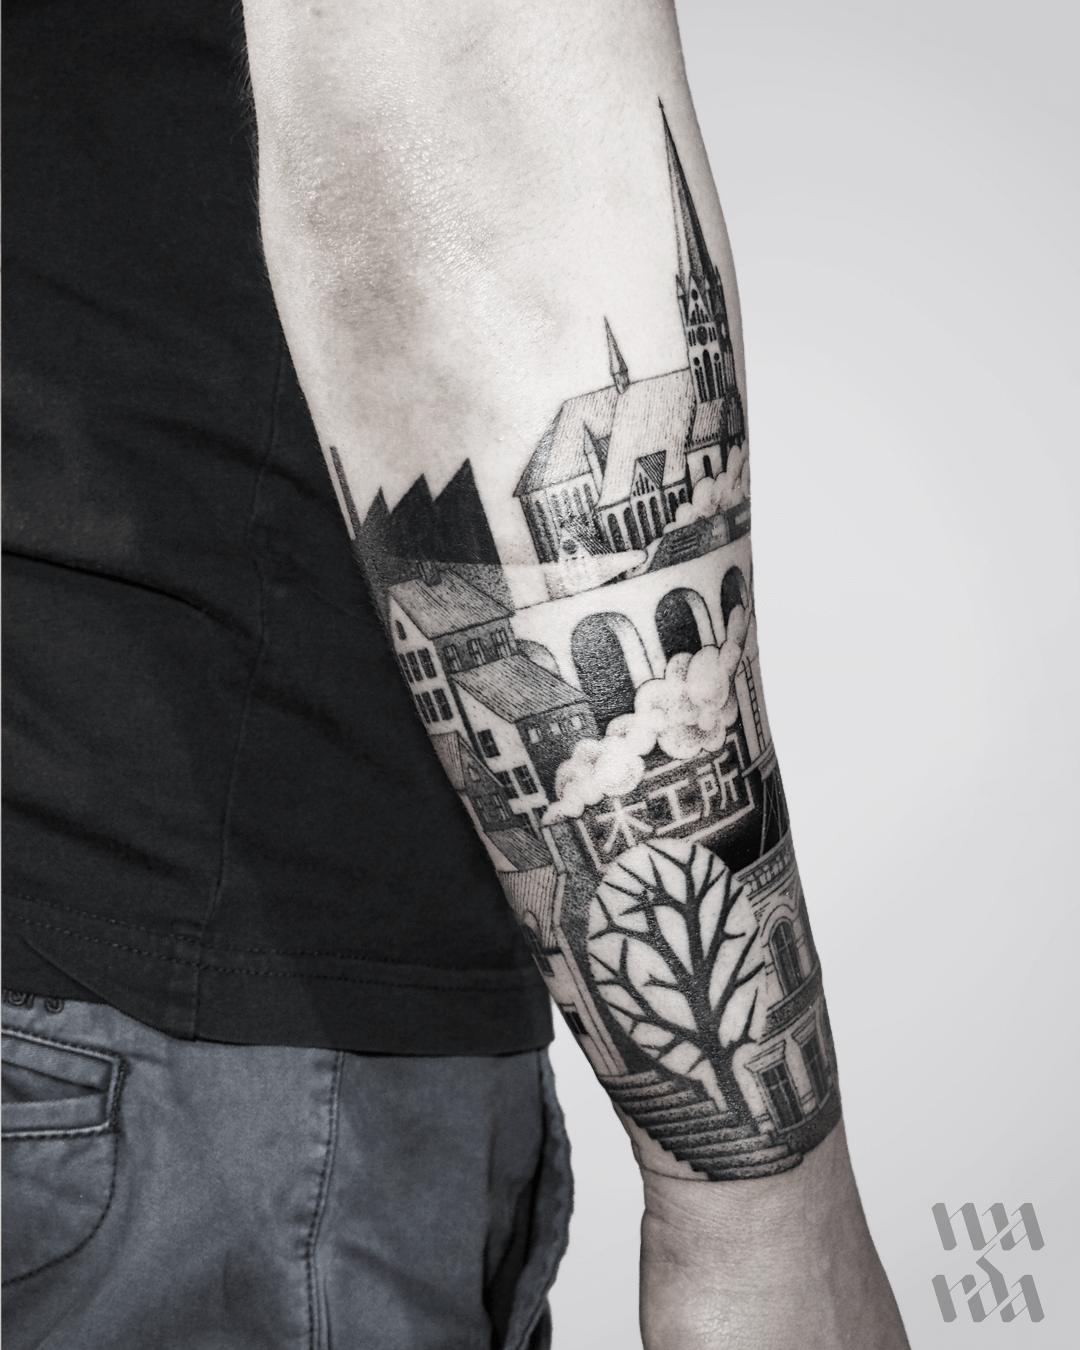 City landscape tattoo by Warda